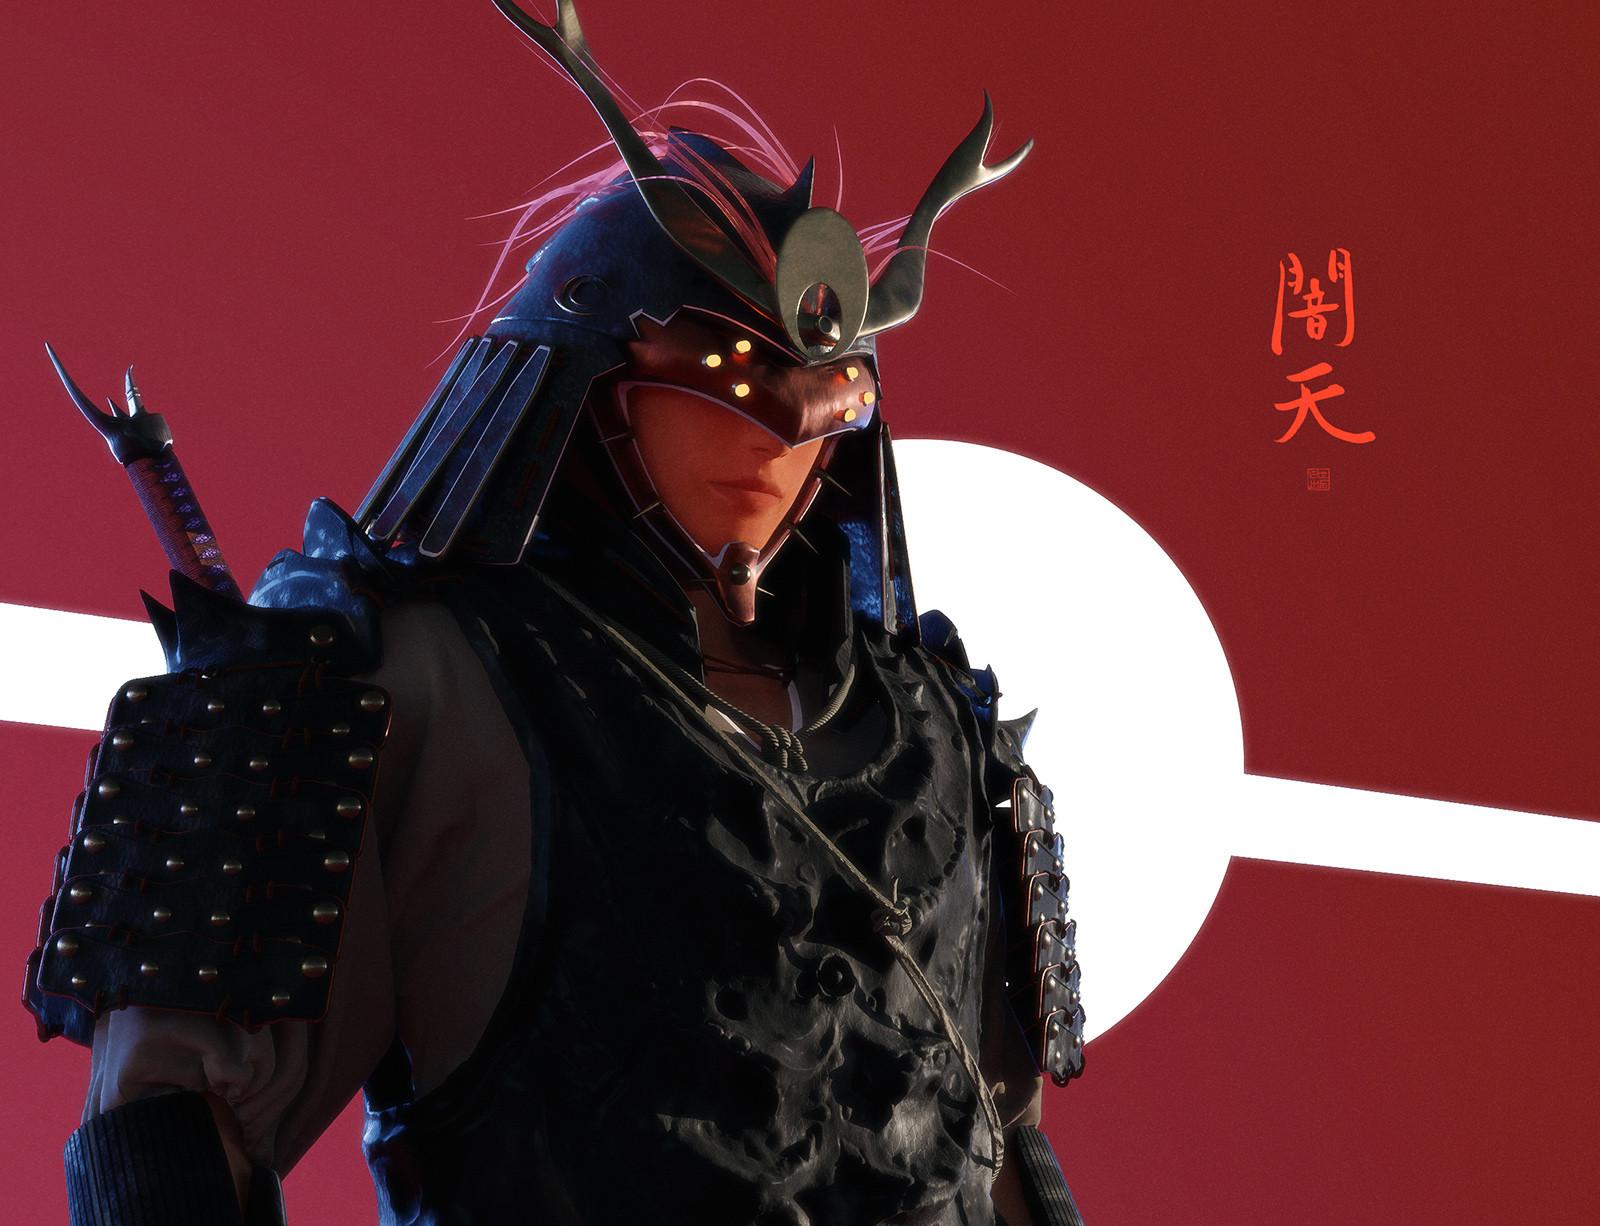 Lorenz hideyoshi ruwwe samurai portrait1 s